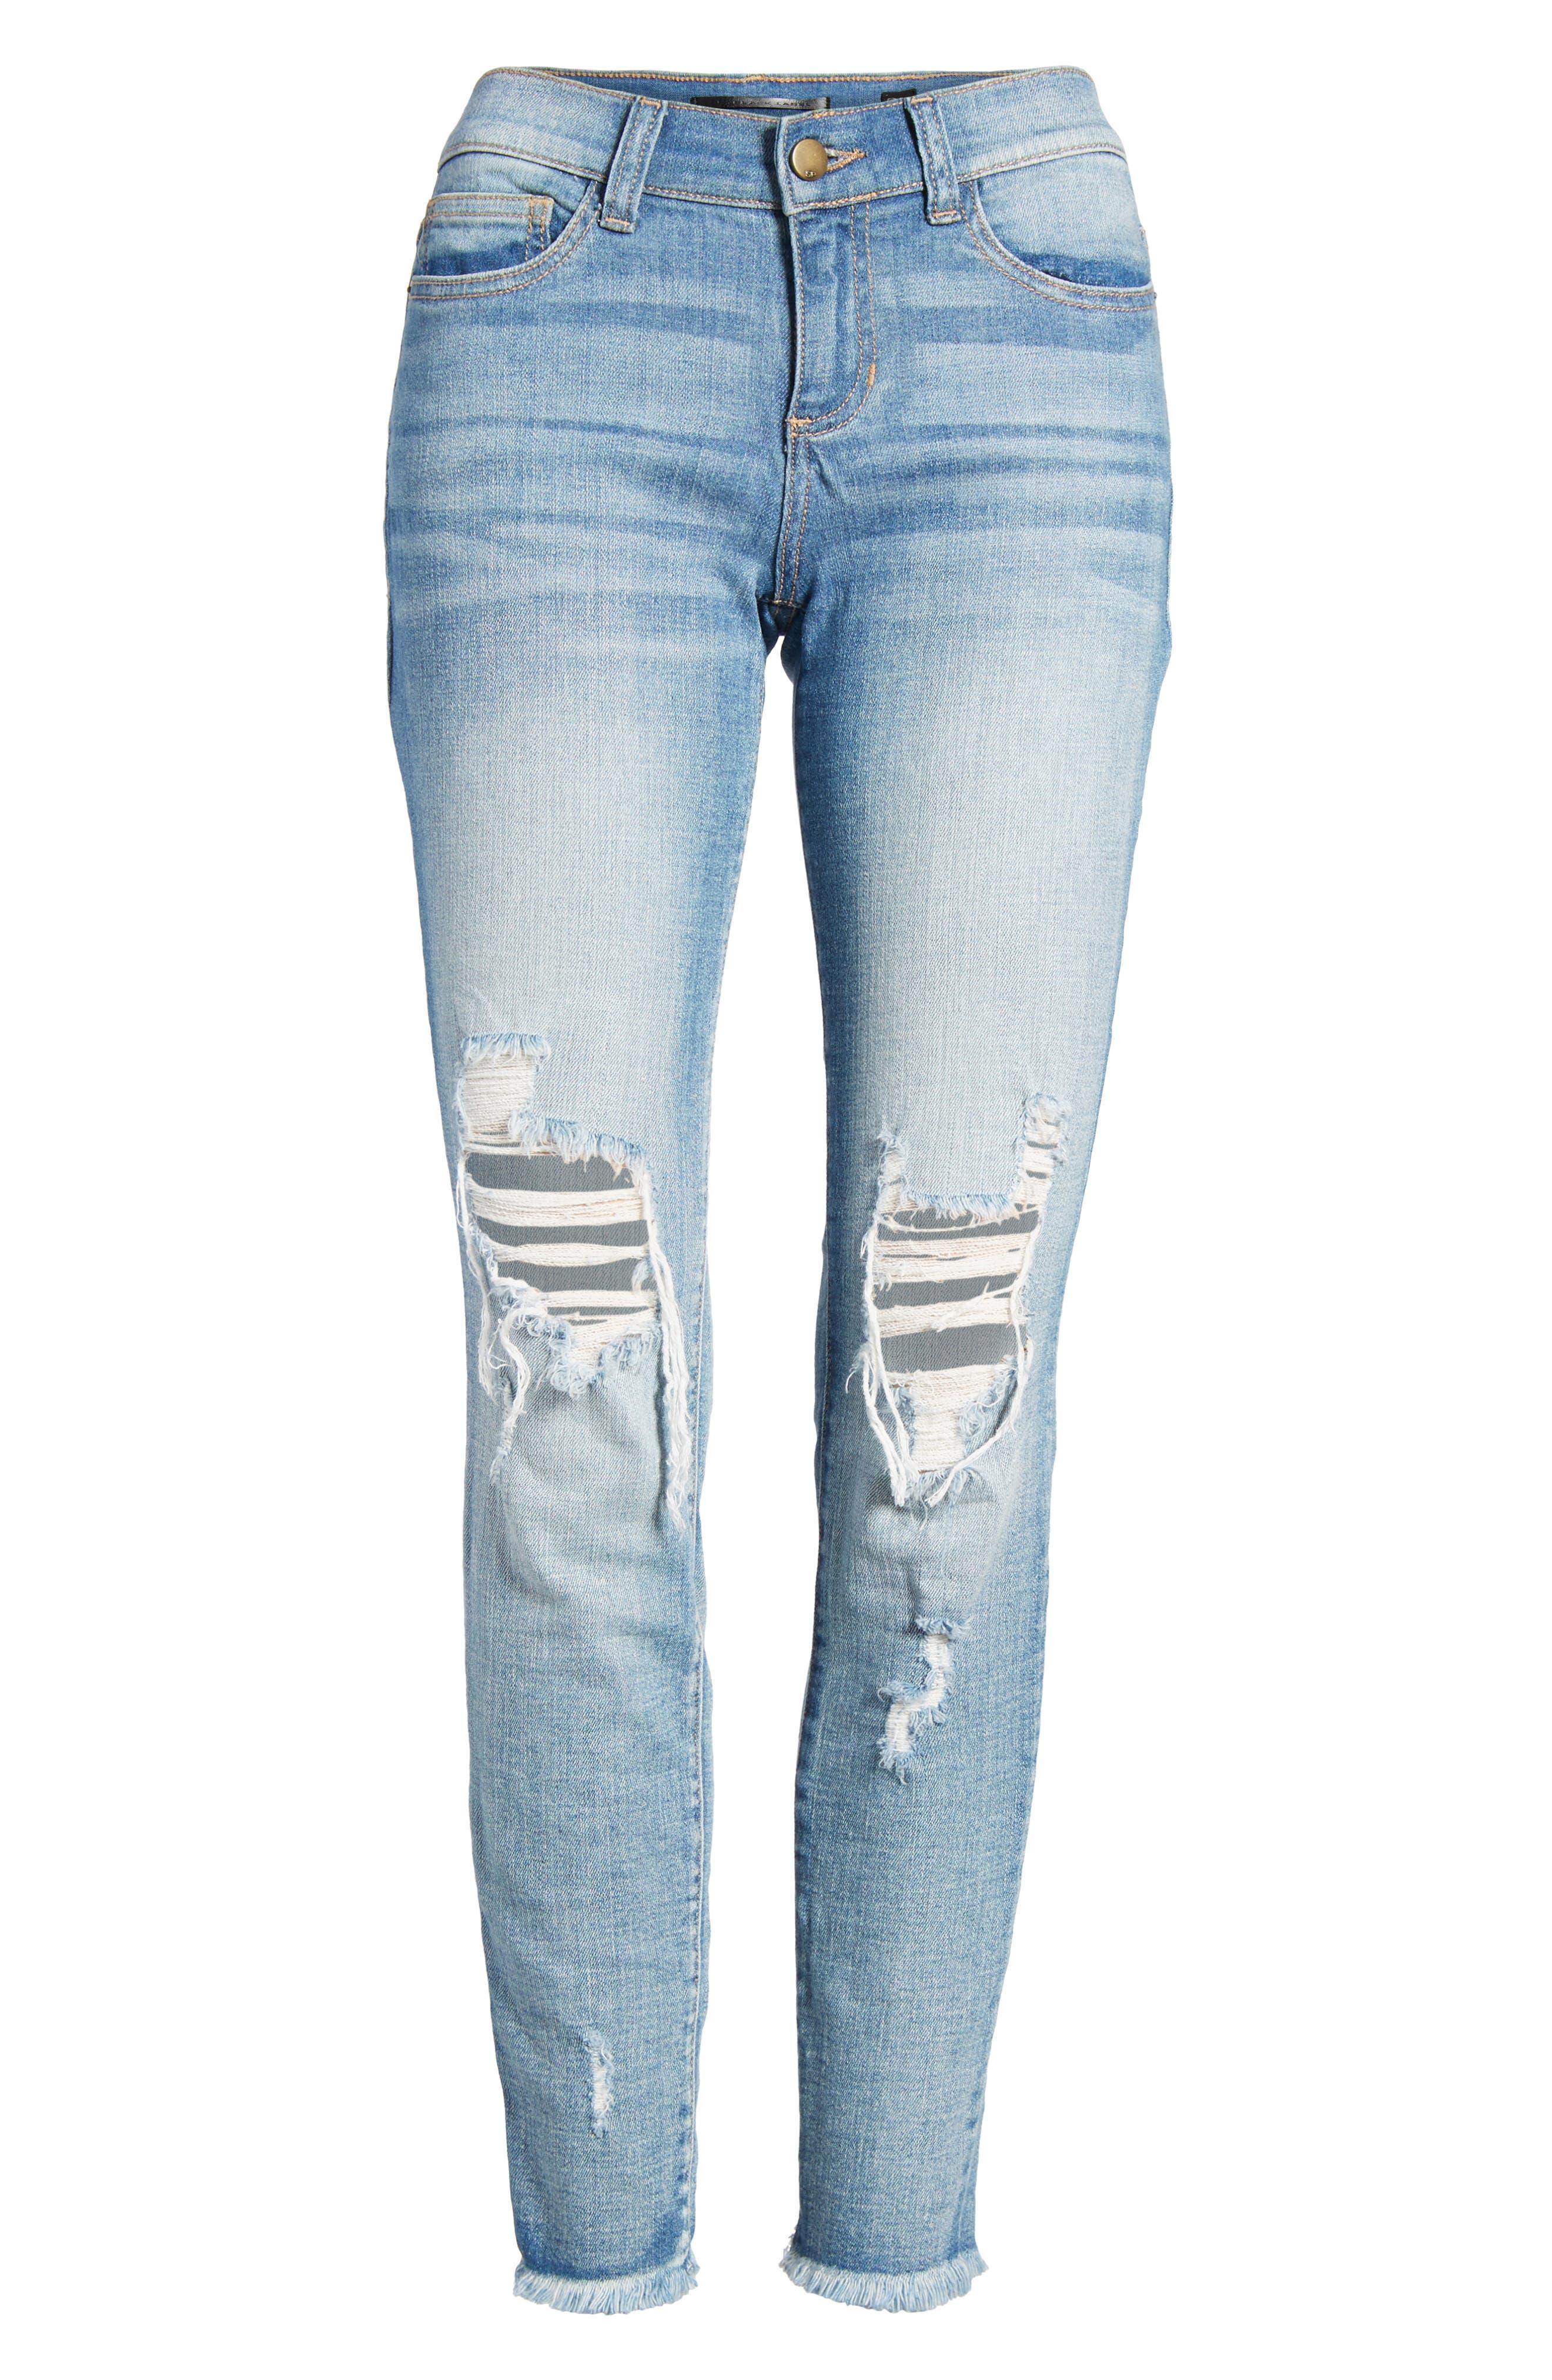 Ripped Knee Skinny Jeans,                             Alternate thumbnail 7, color,                             MEDIUM LIGHT